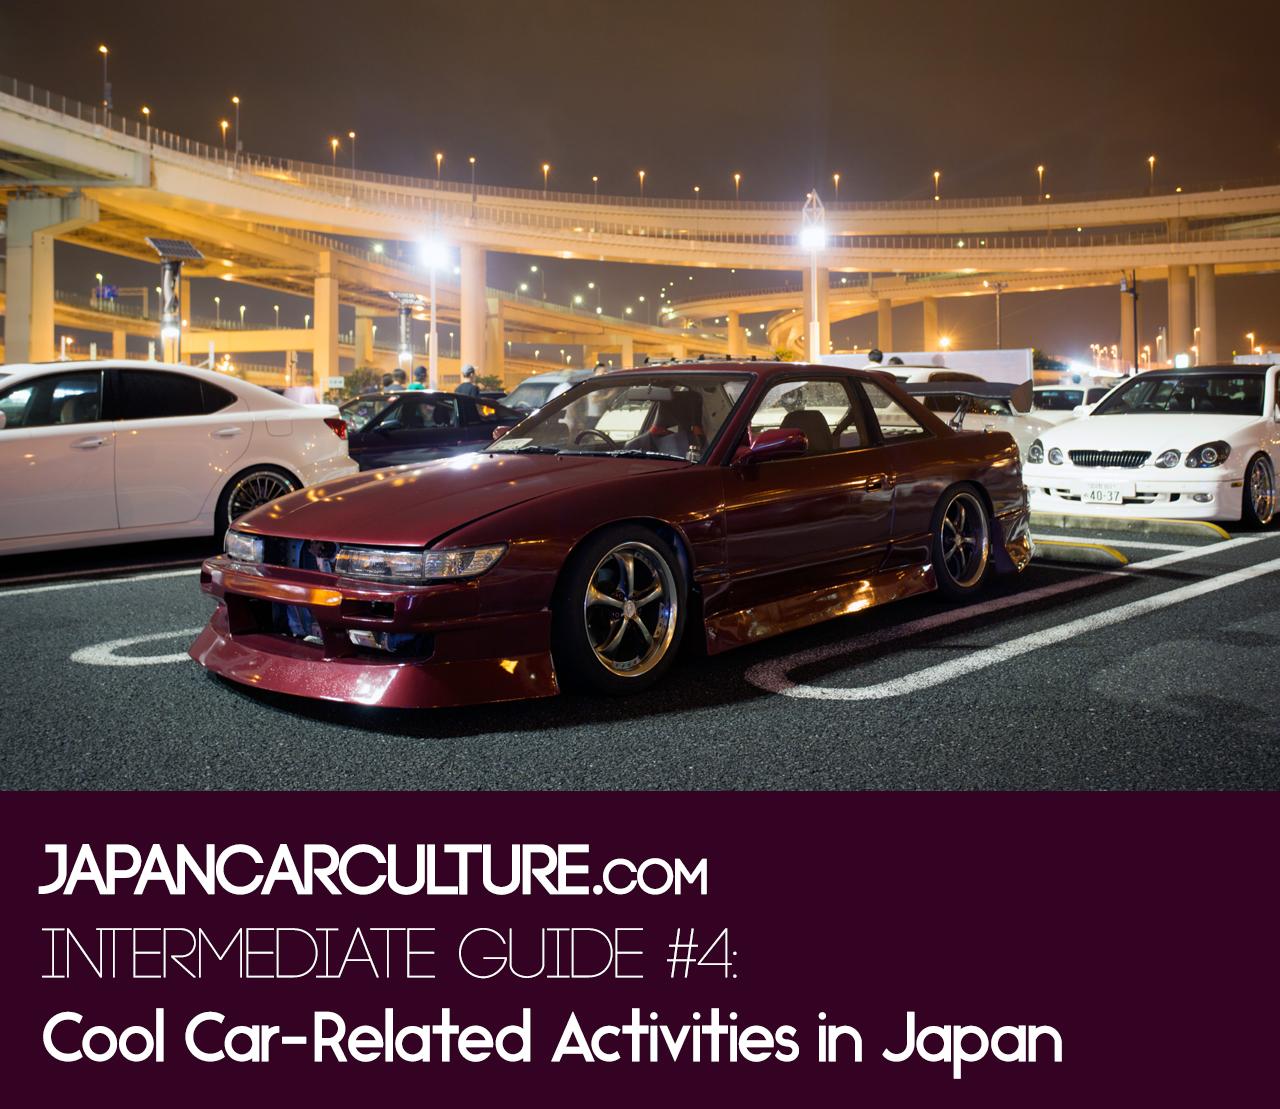 Cool Car Related Activities Japan Car Culture